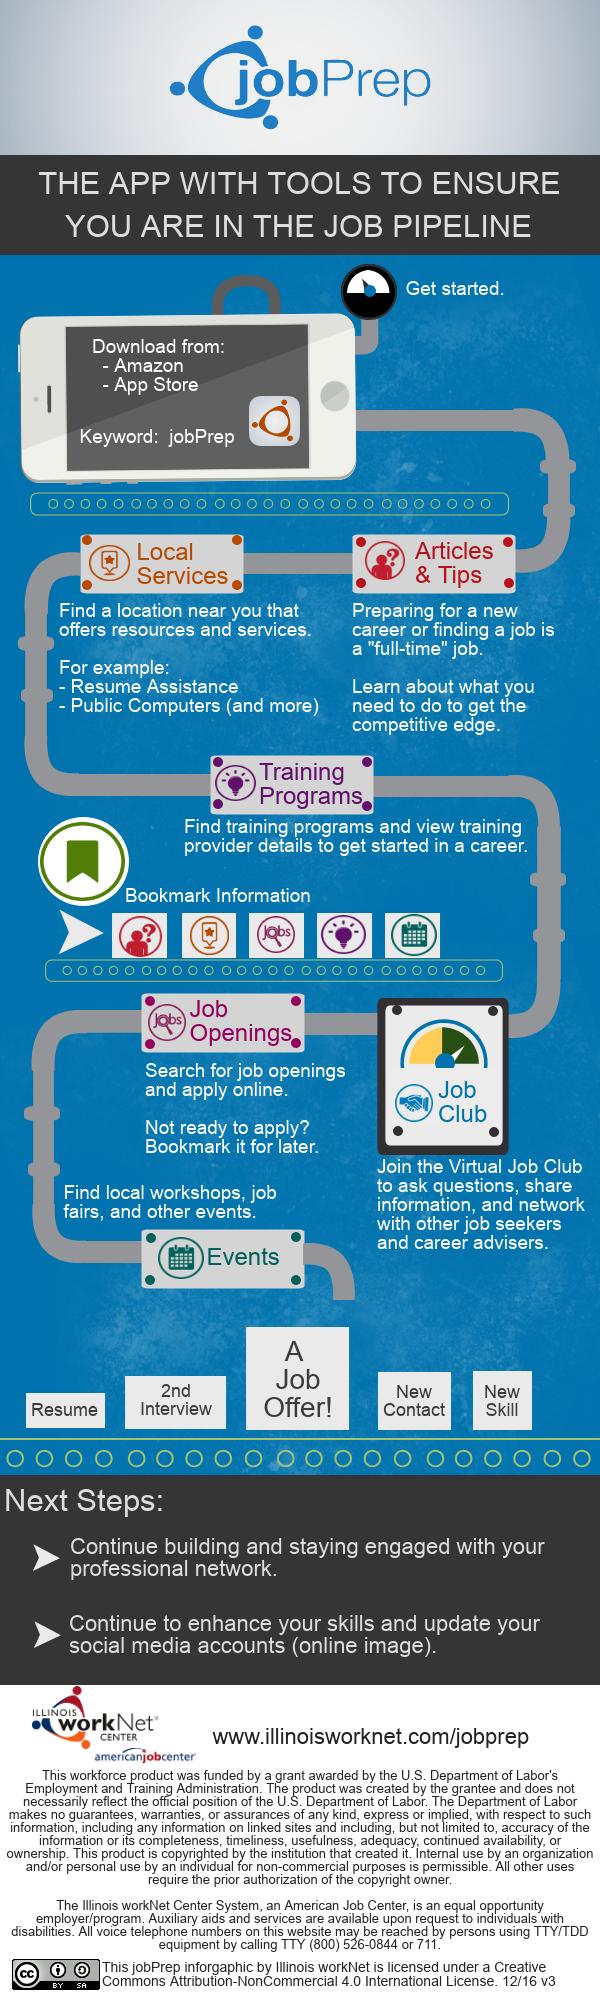 jobPrep App Infographic